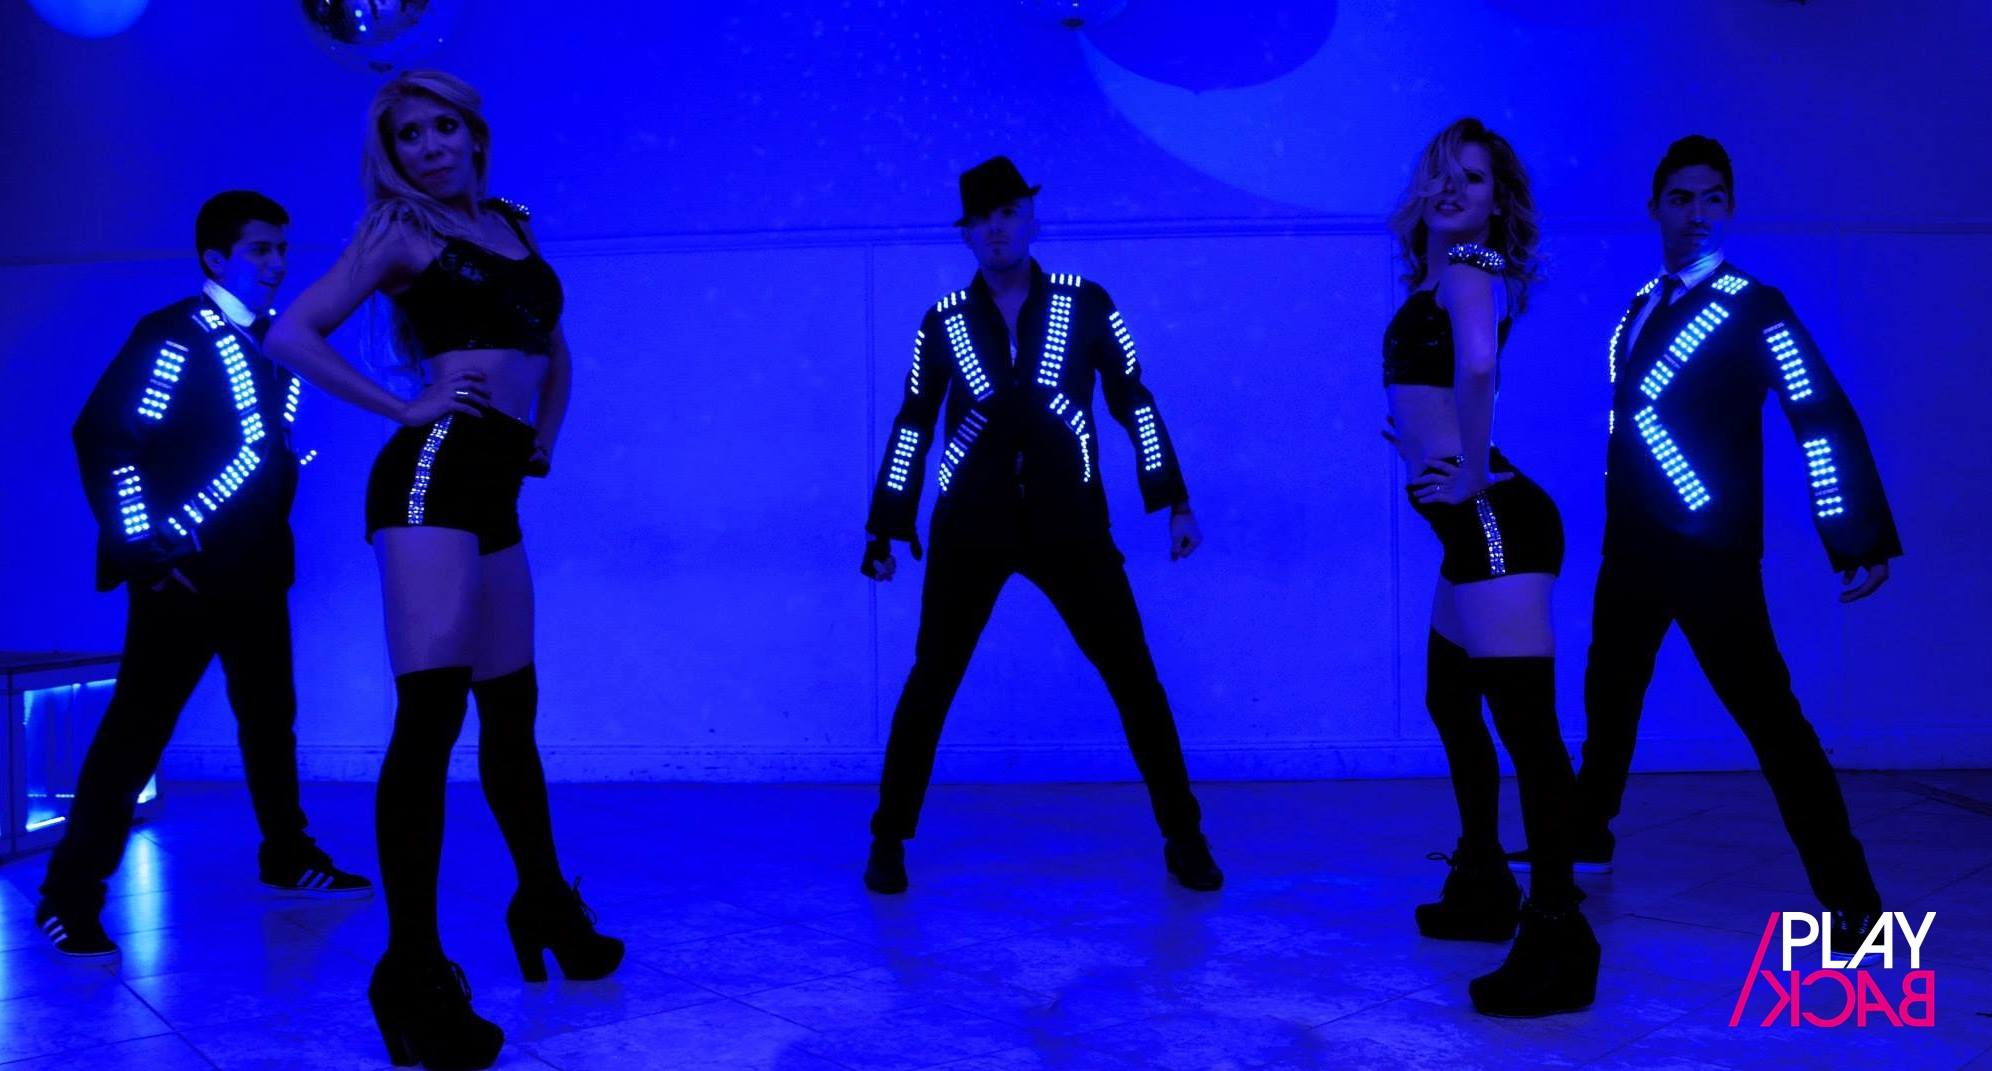 Chaquetas-Grupo Playback